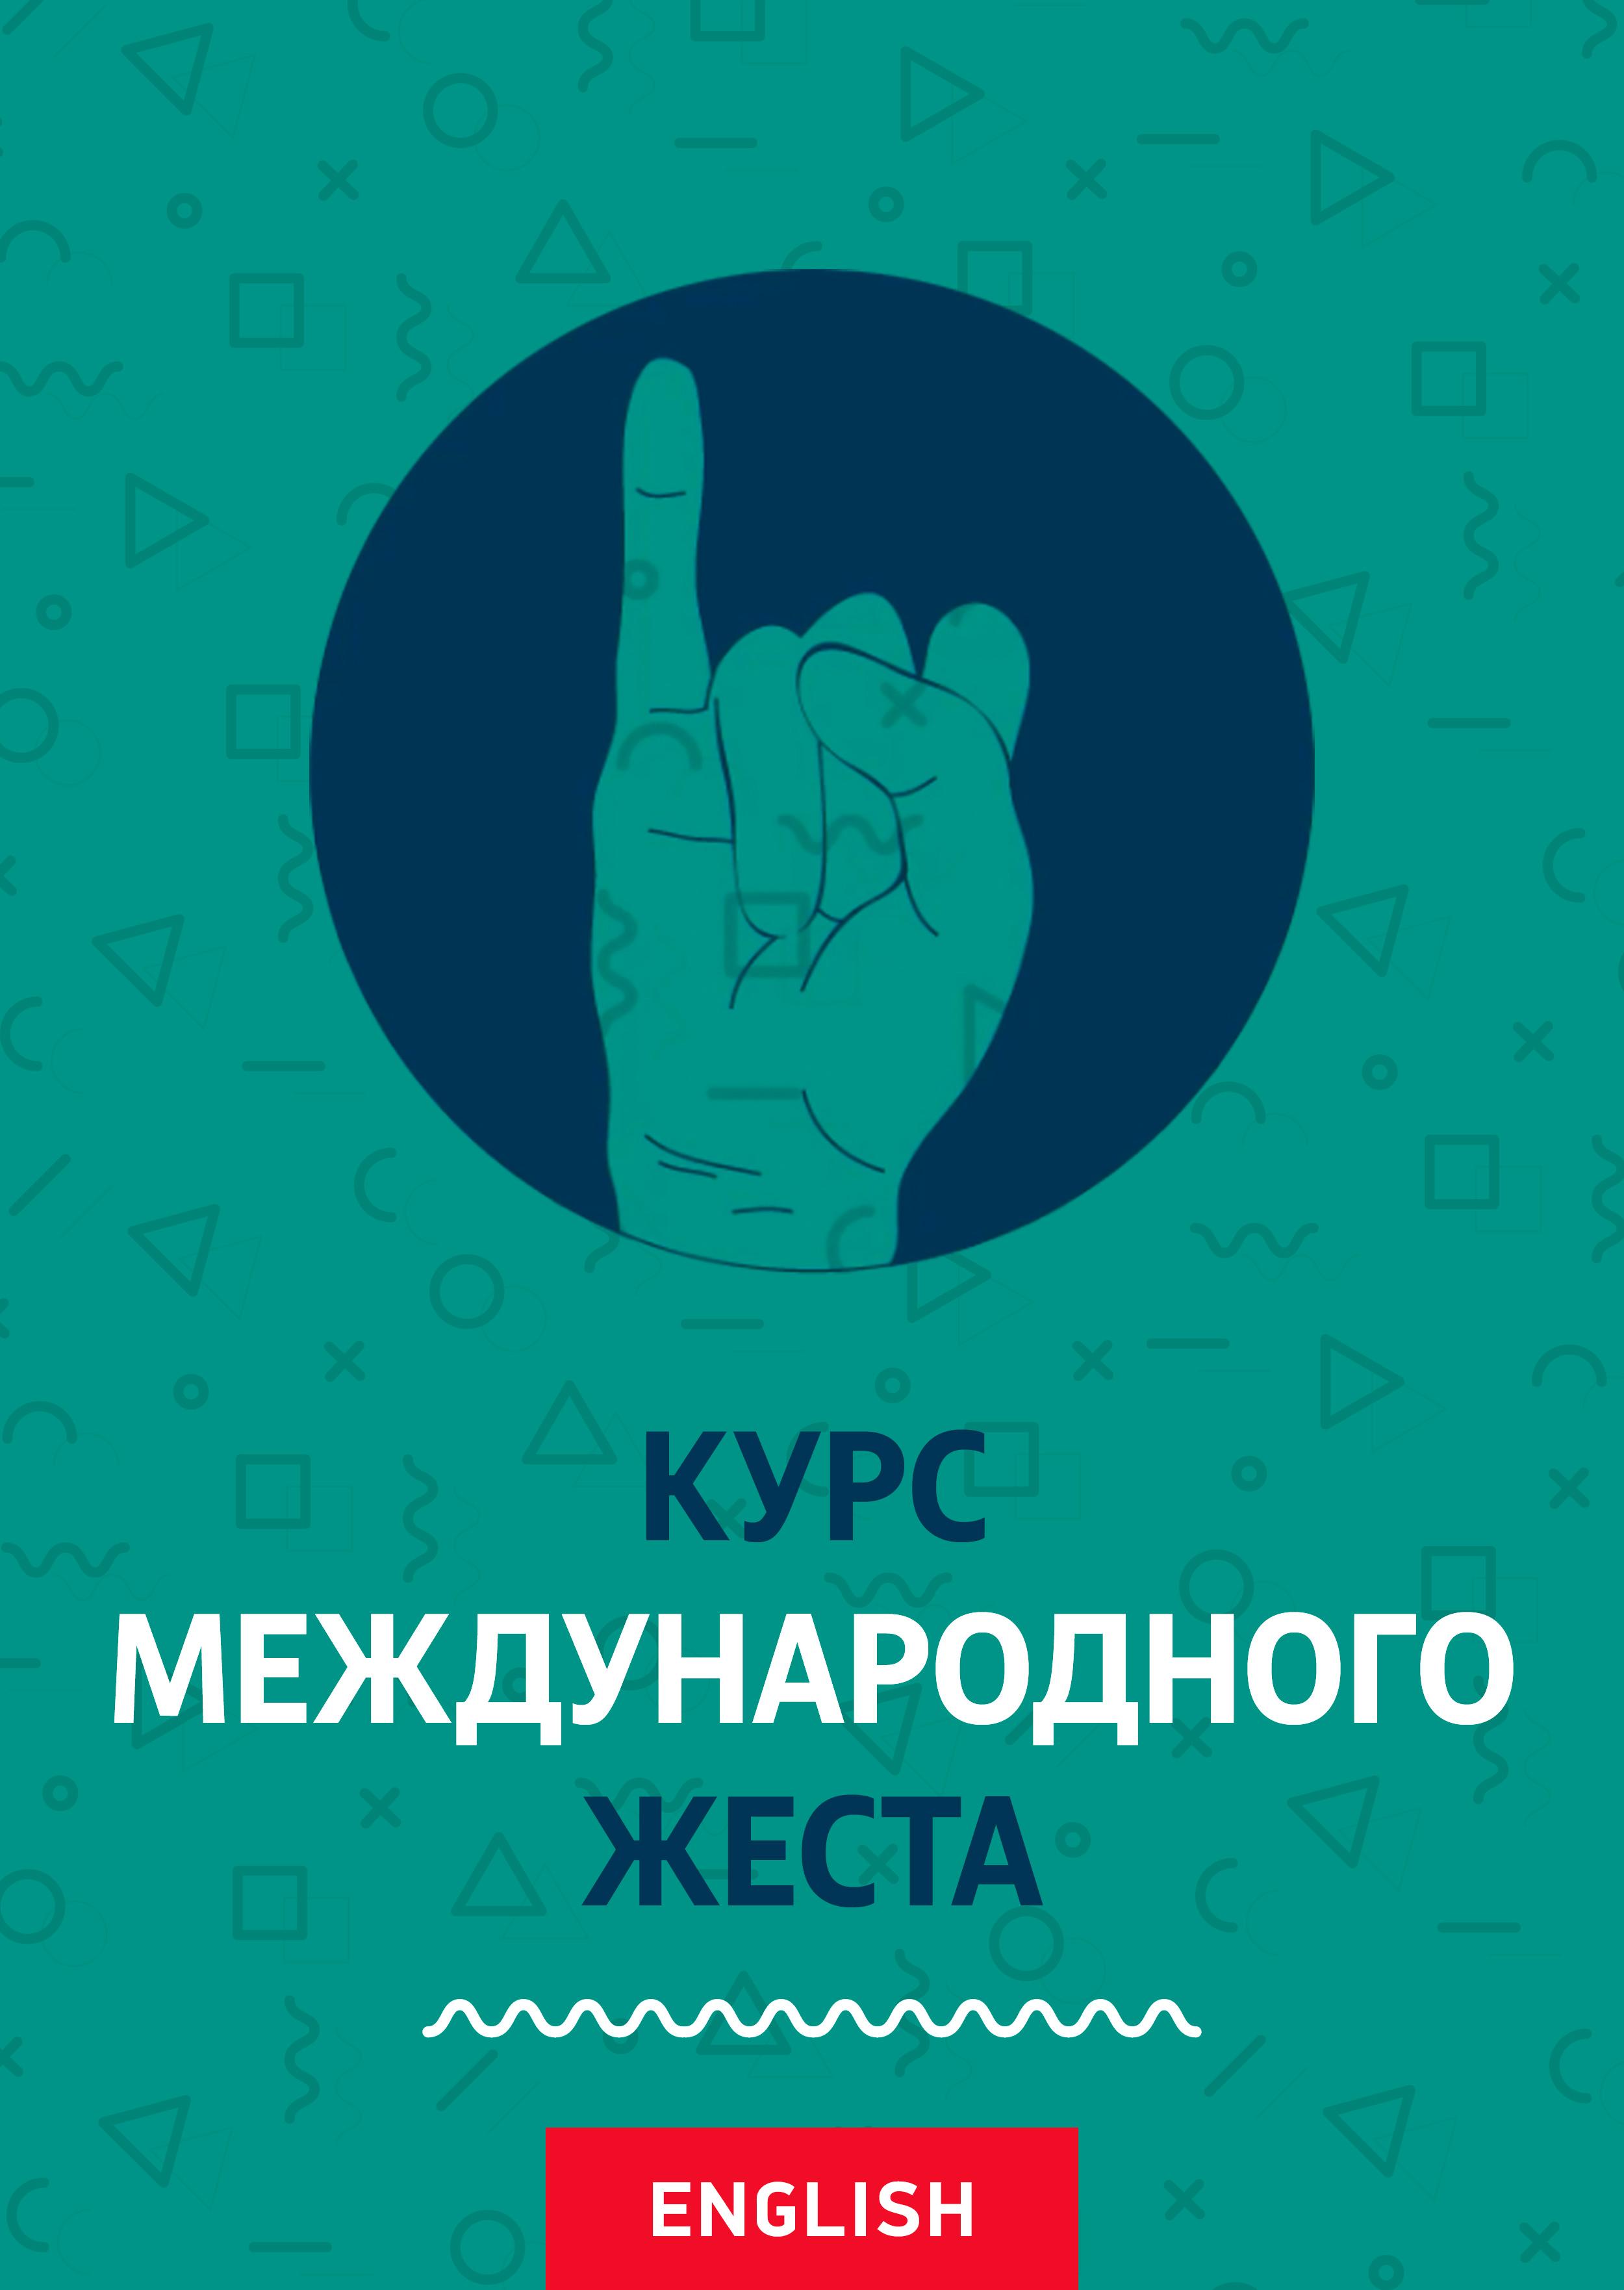 Курс международного жеста (на английском)